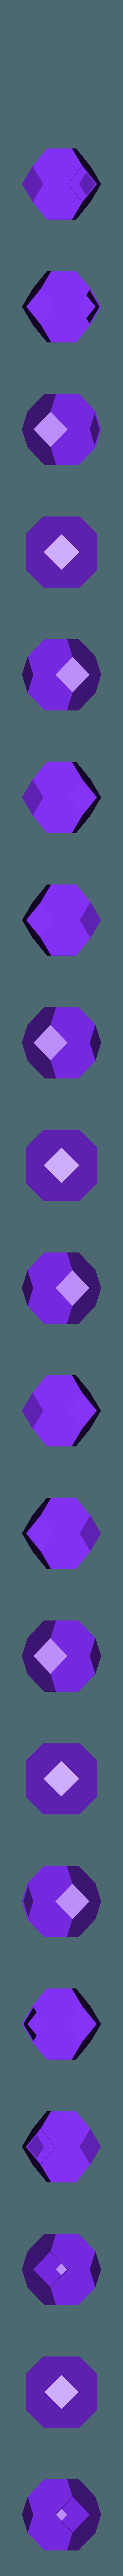 mini geodesic dome planter.stl Download free STL file Mini planter • 3D printing design, solunkejagruti